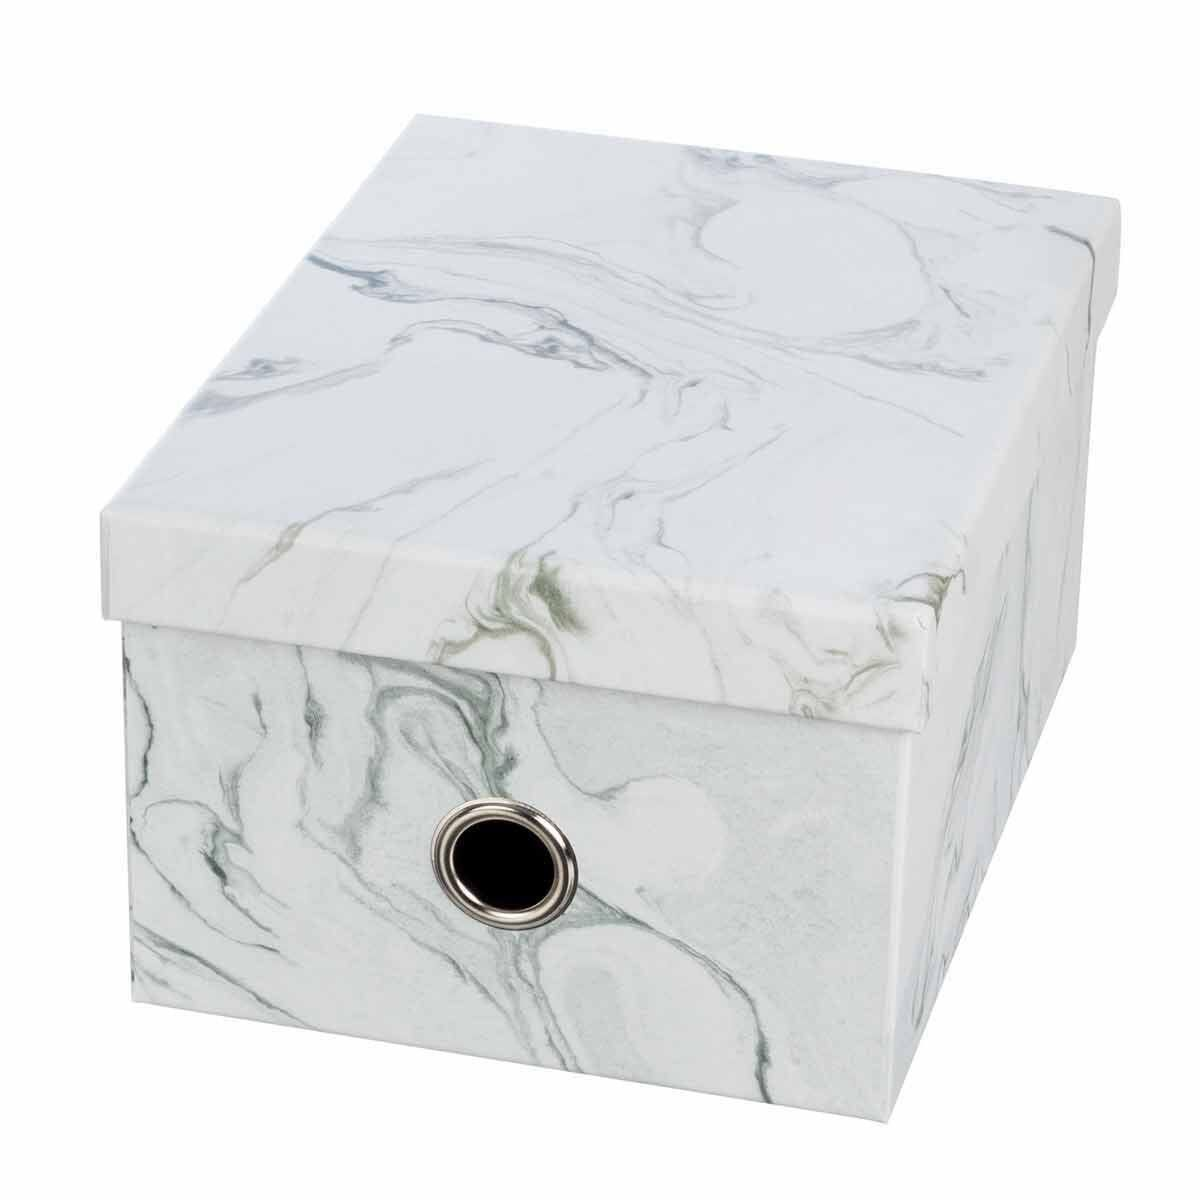 Ryman Storage Box Medium Marble Grey